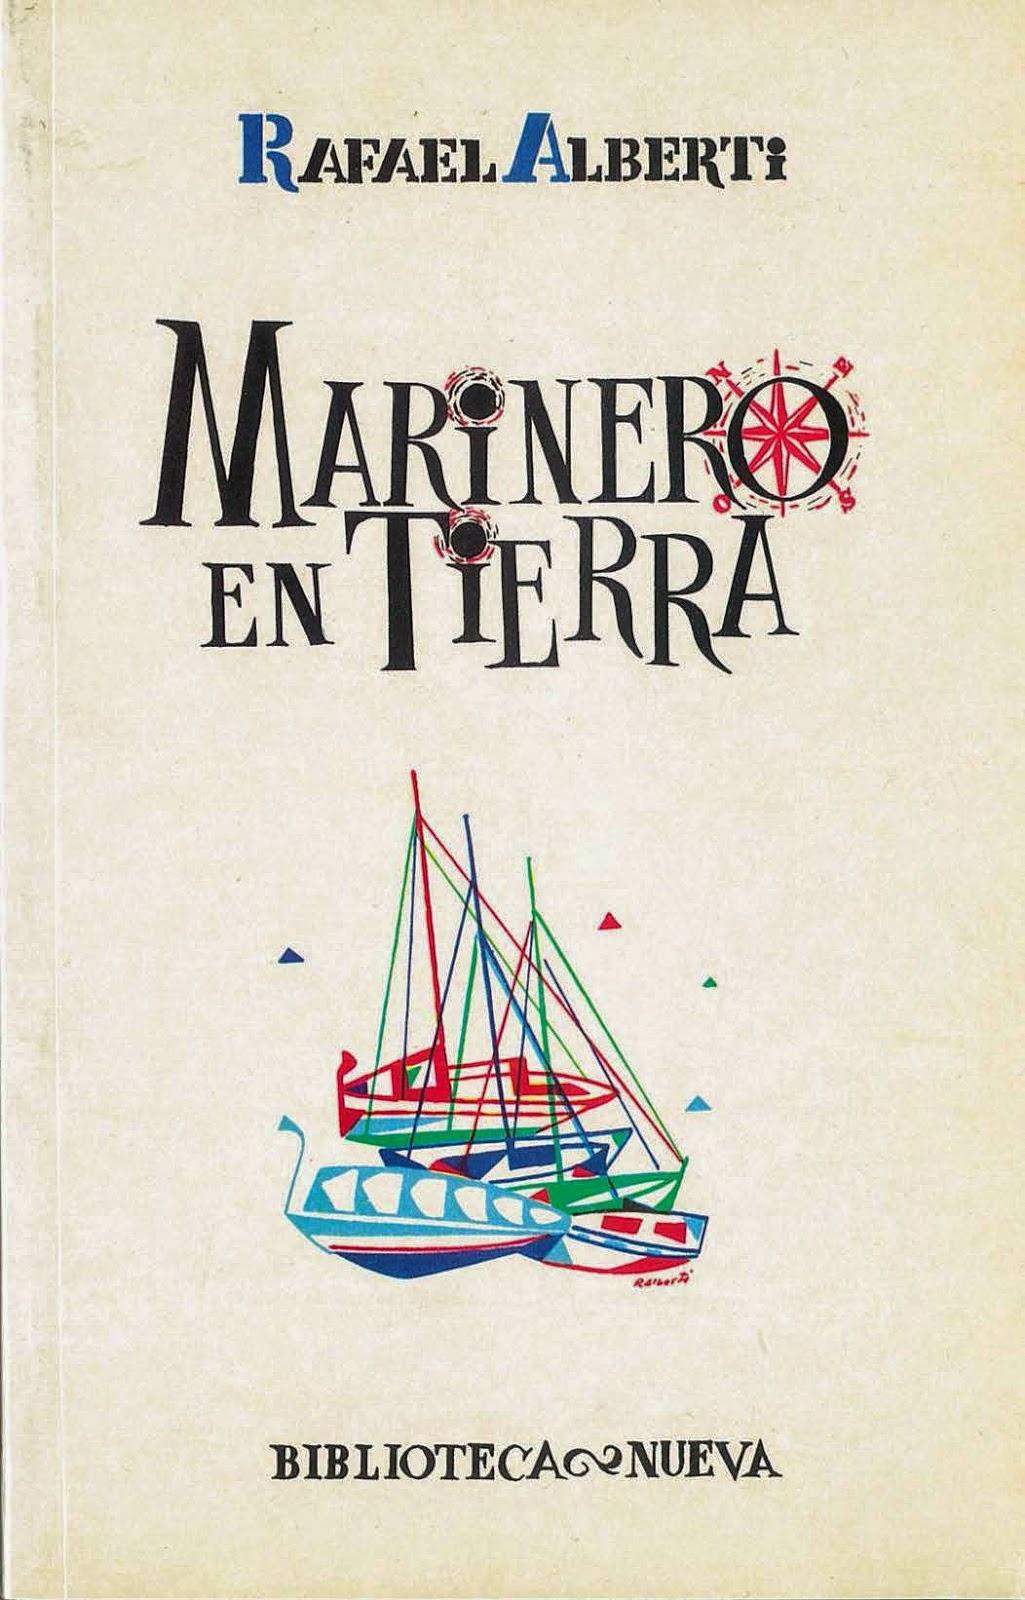 Marinero en Tierra (Rafael Alberti, 1924)